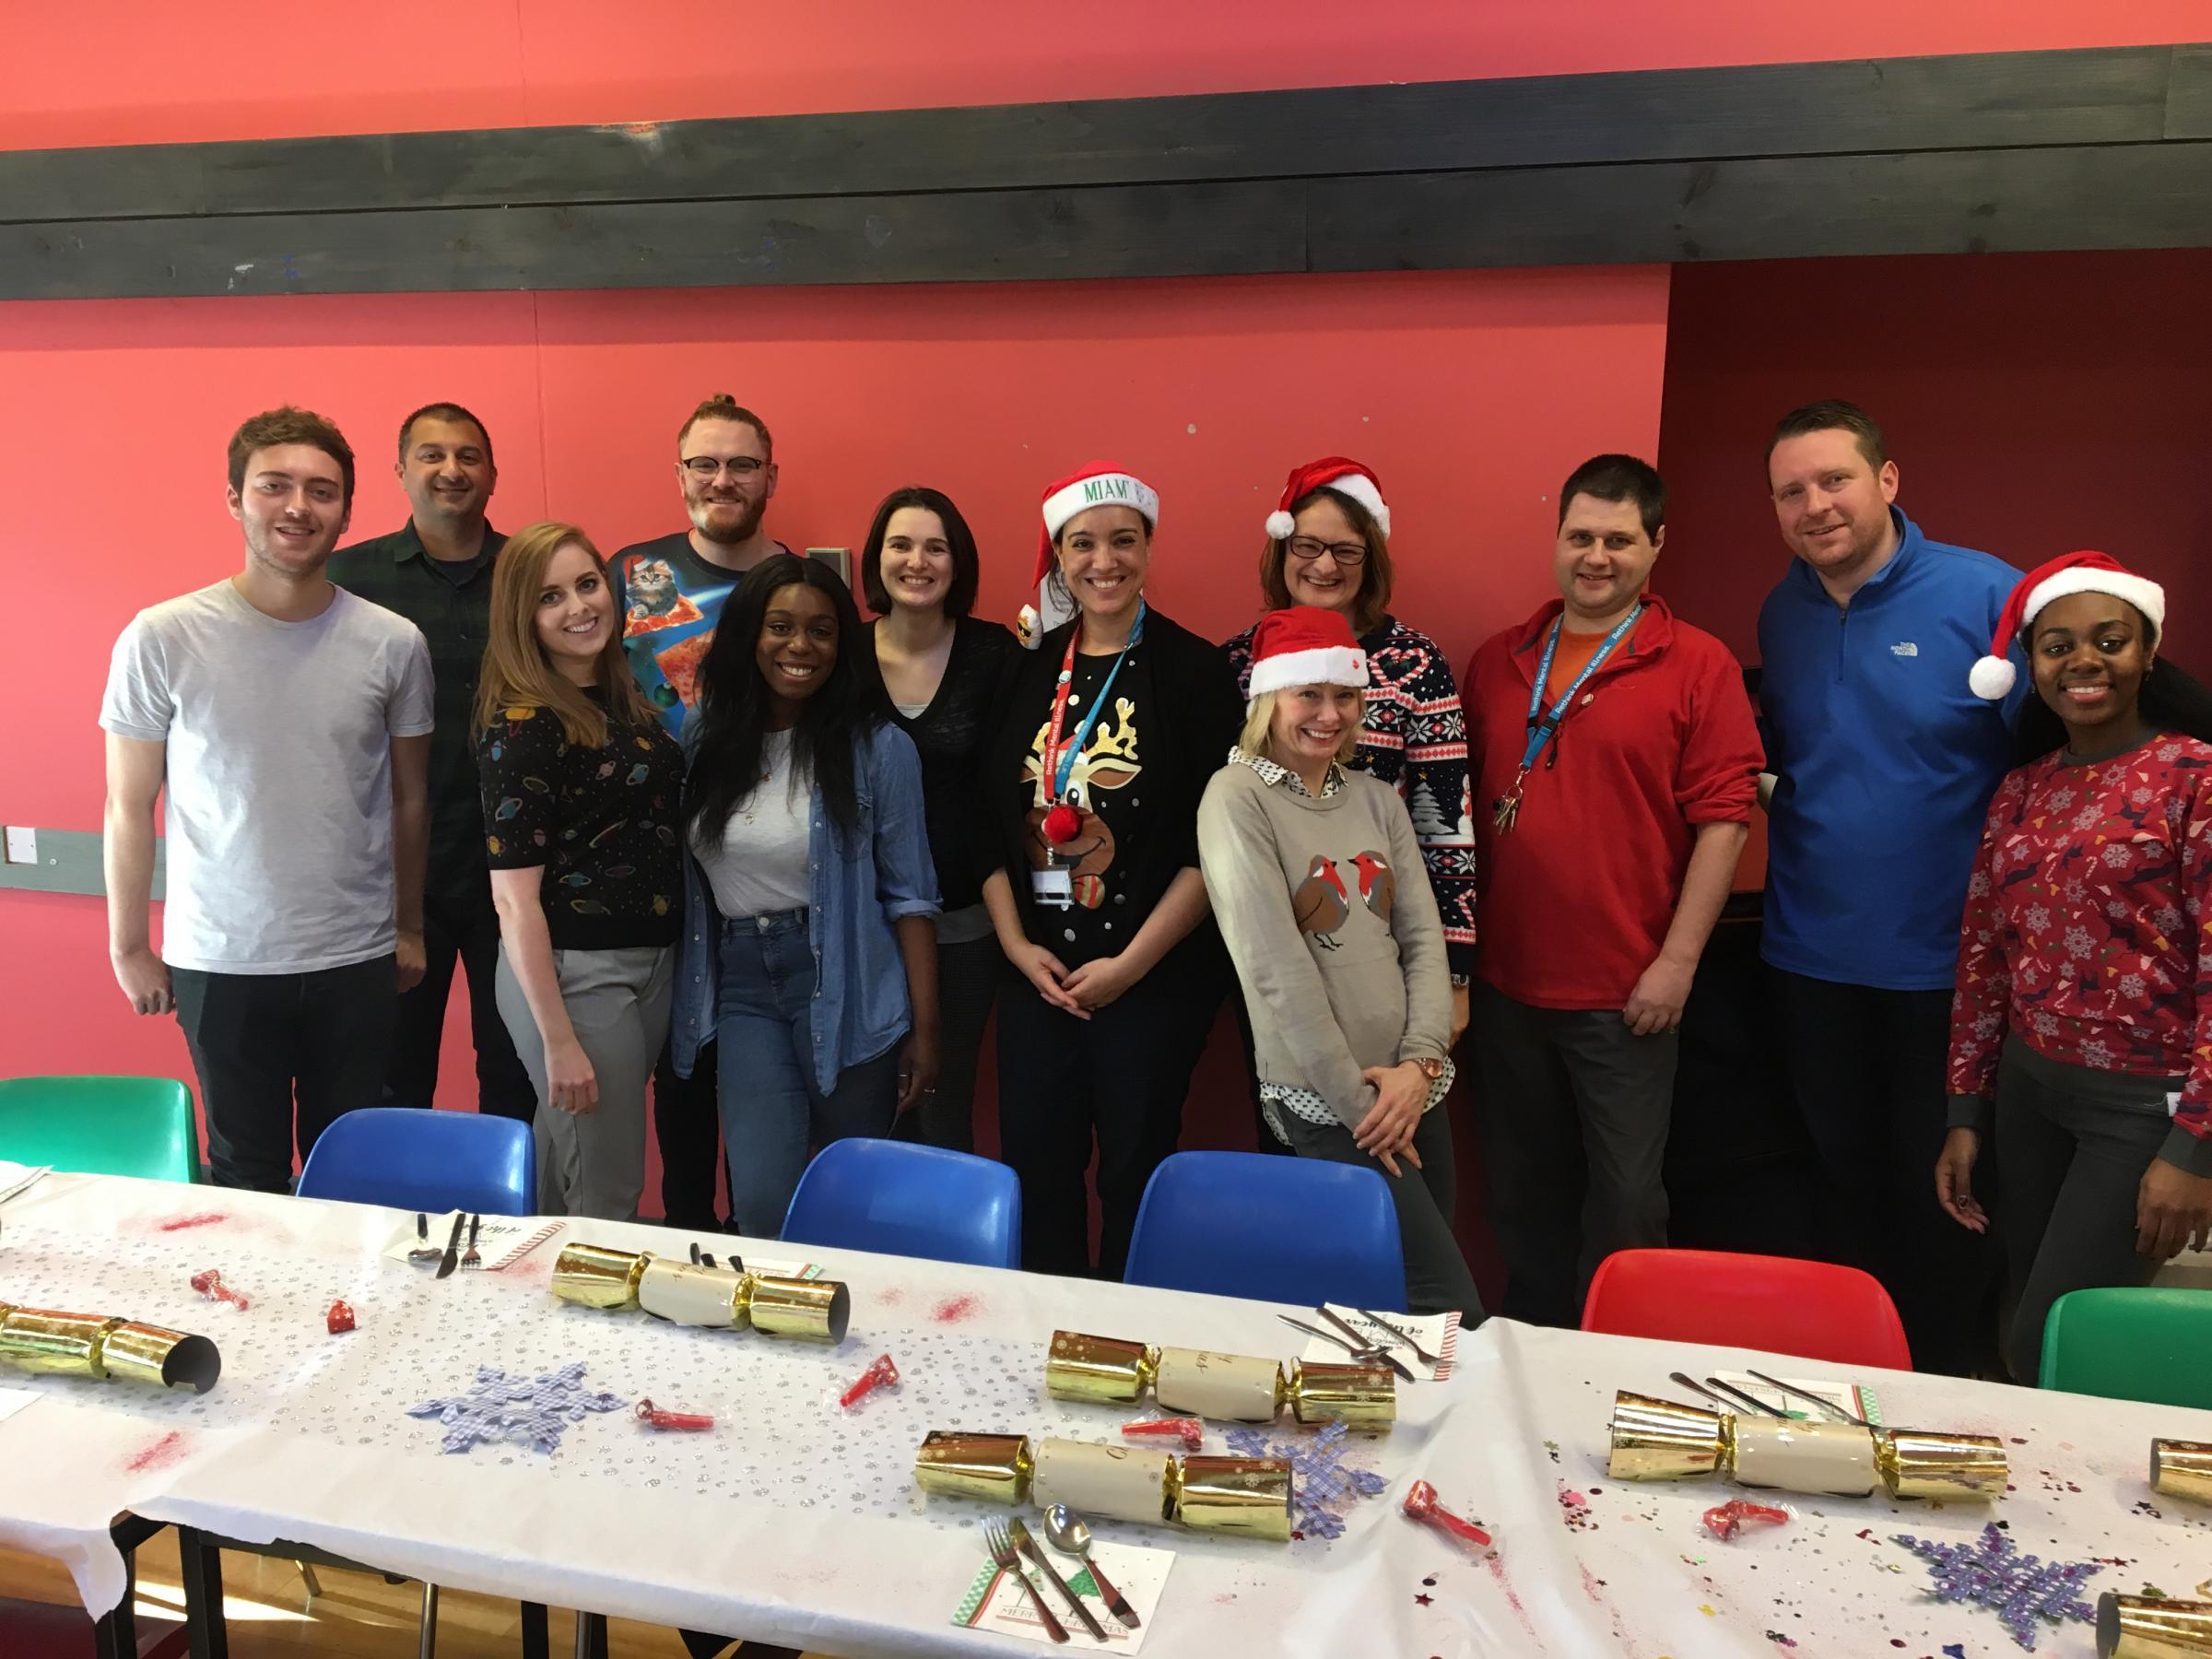 Pizza Hut Staff Provide Festive Cheer At Rethink Mental